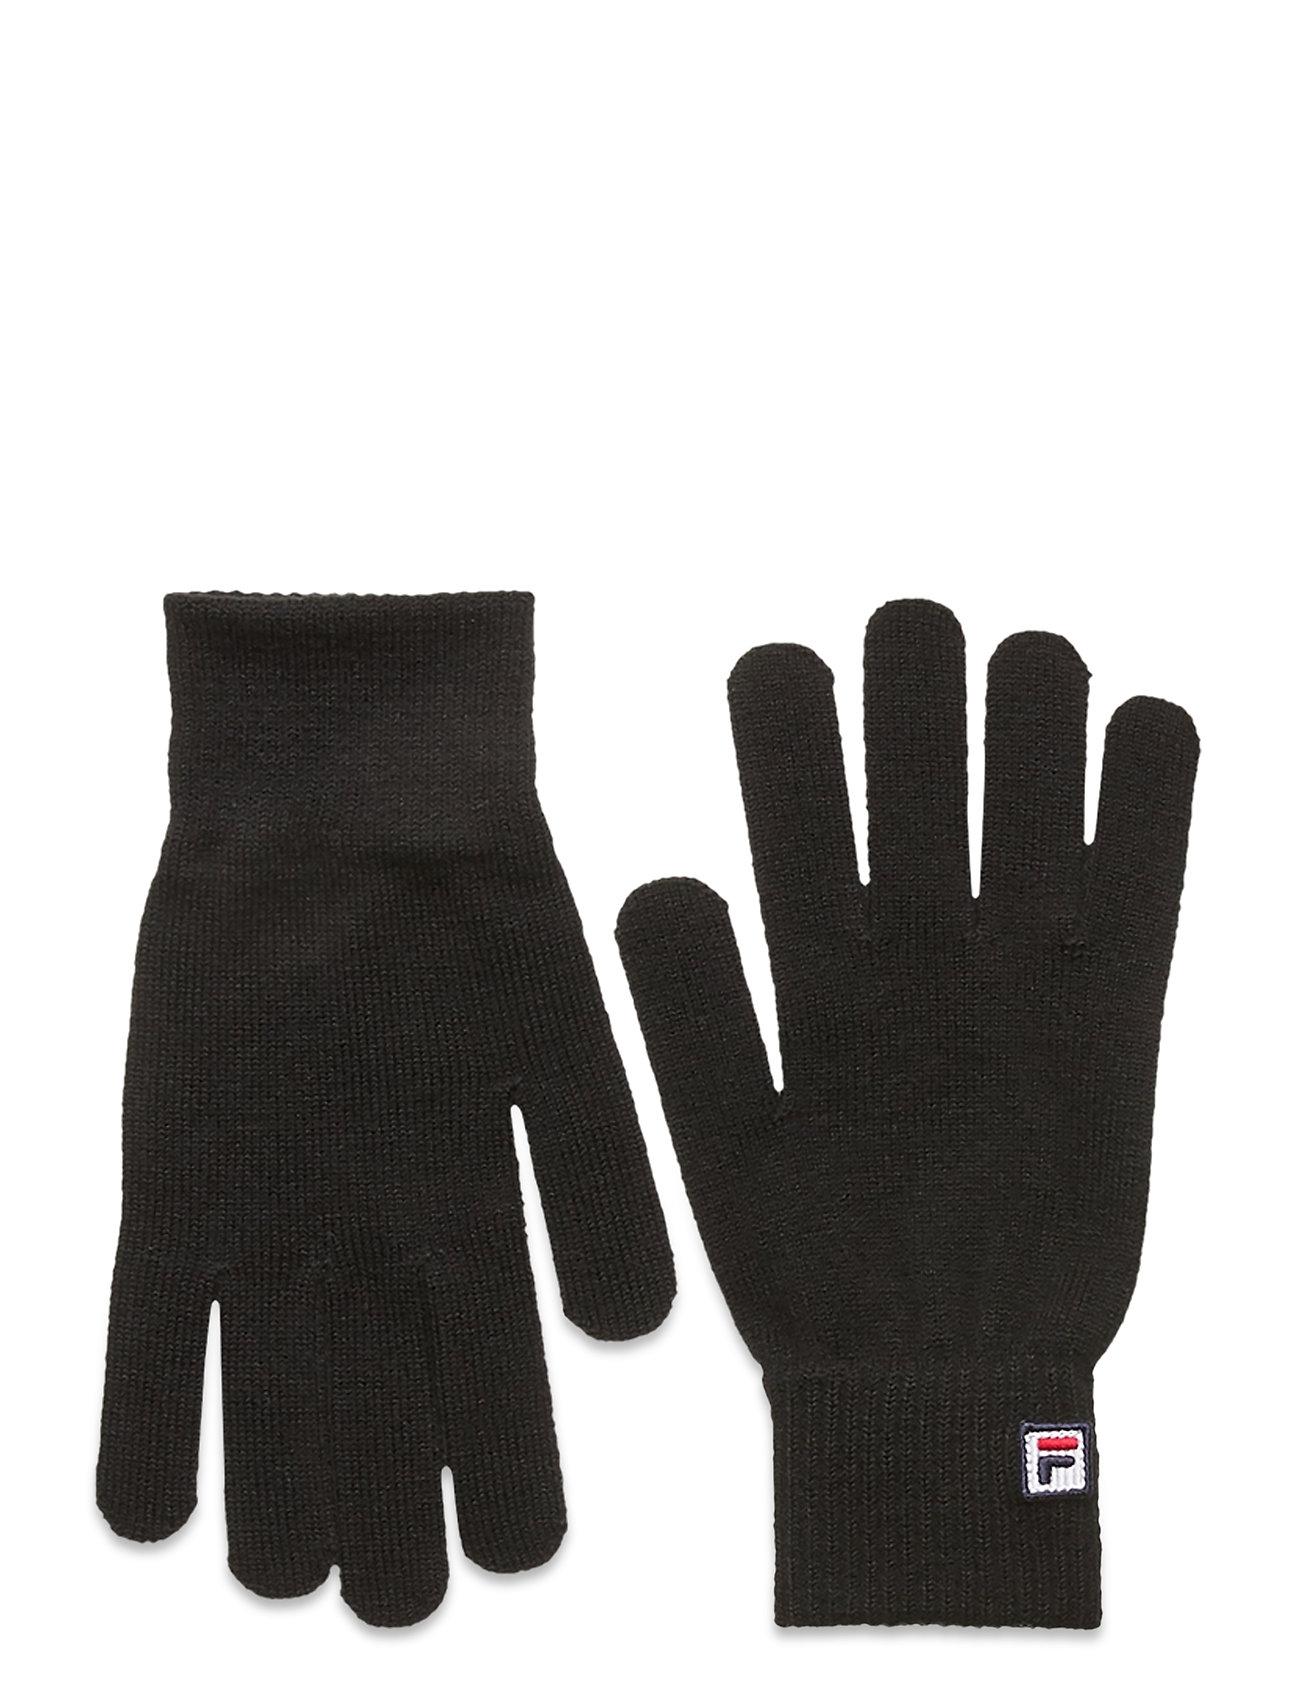 Basic Knitted Gloves With F-Box Logo Handsker Sort FILA